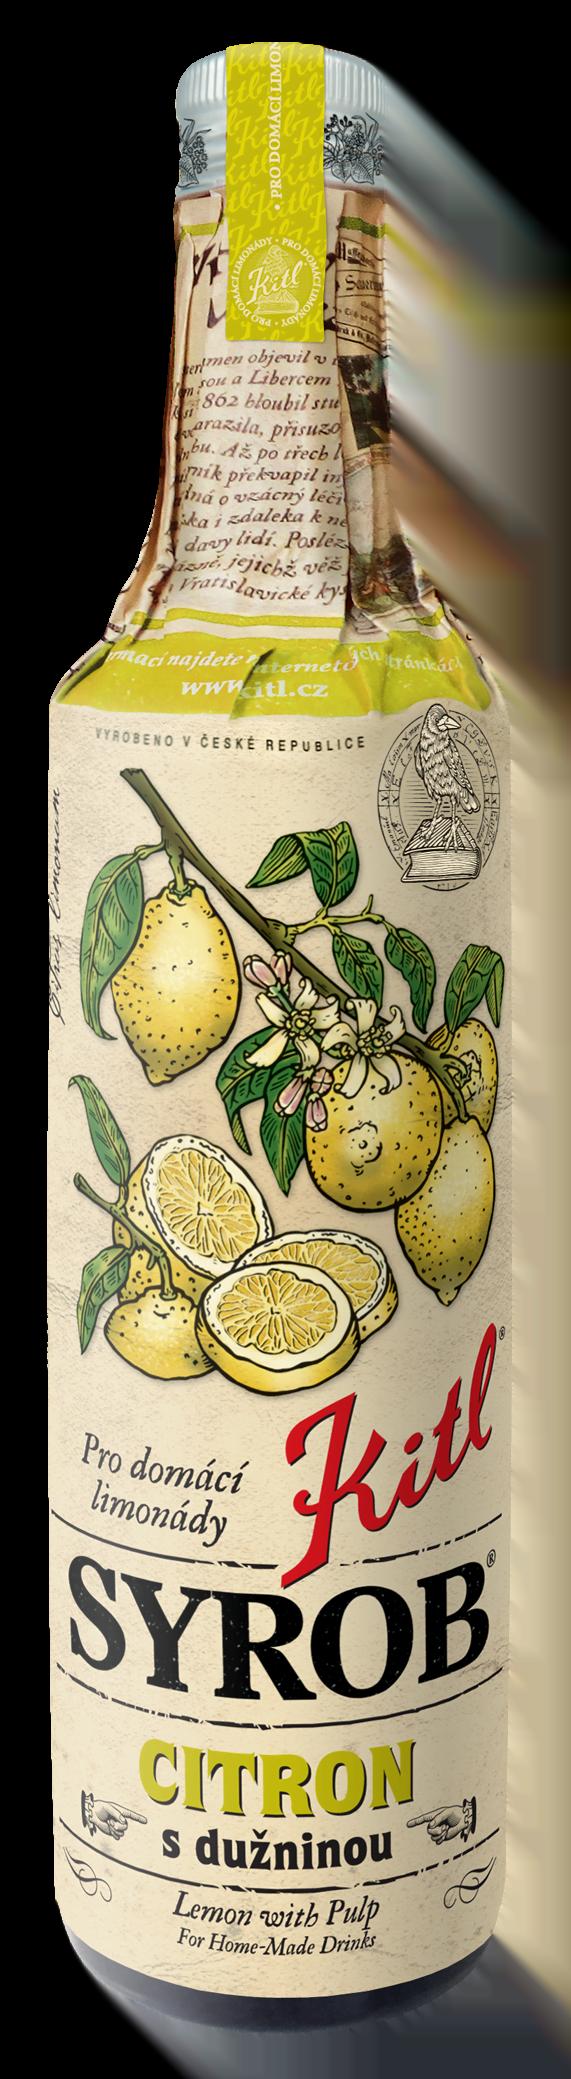 kitl syrob citron 500ml